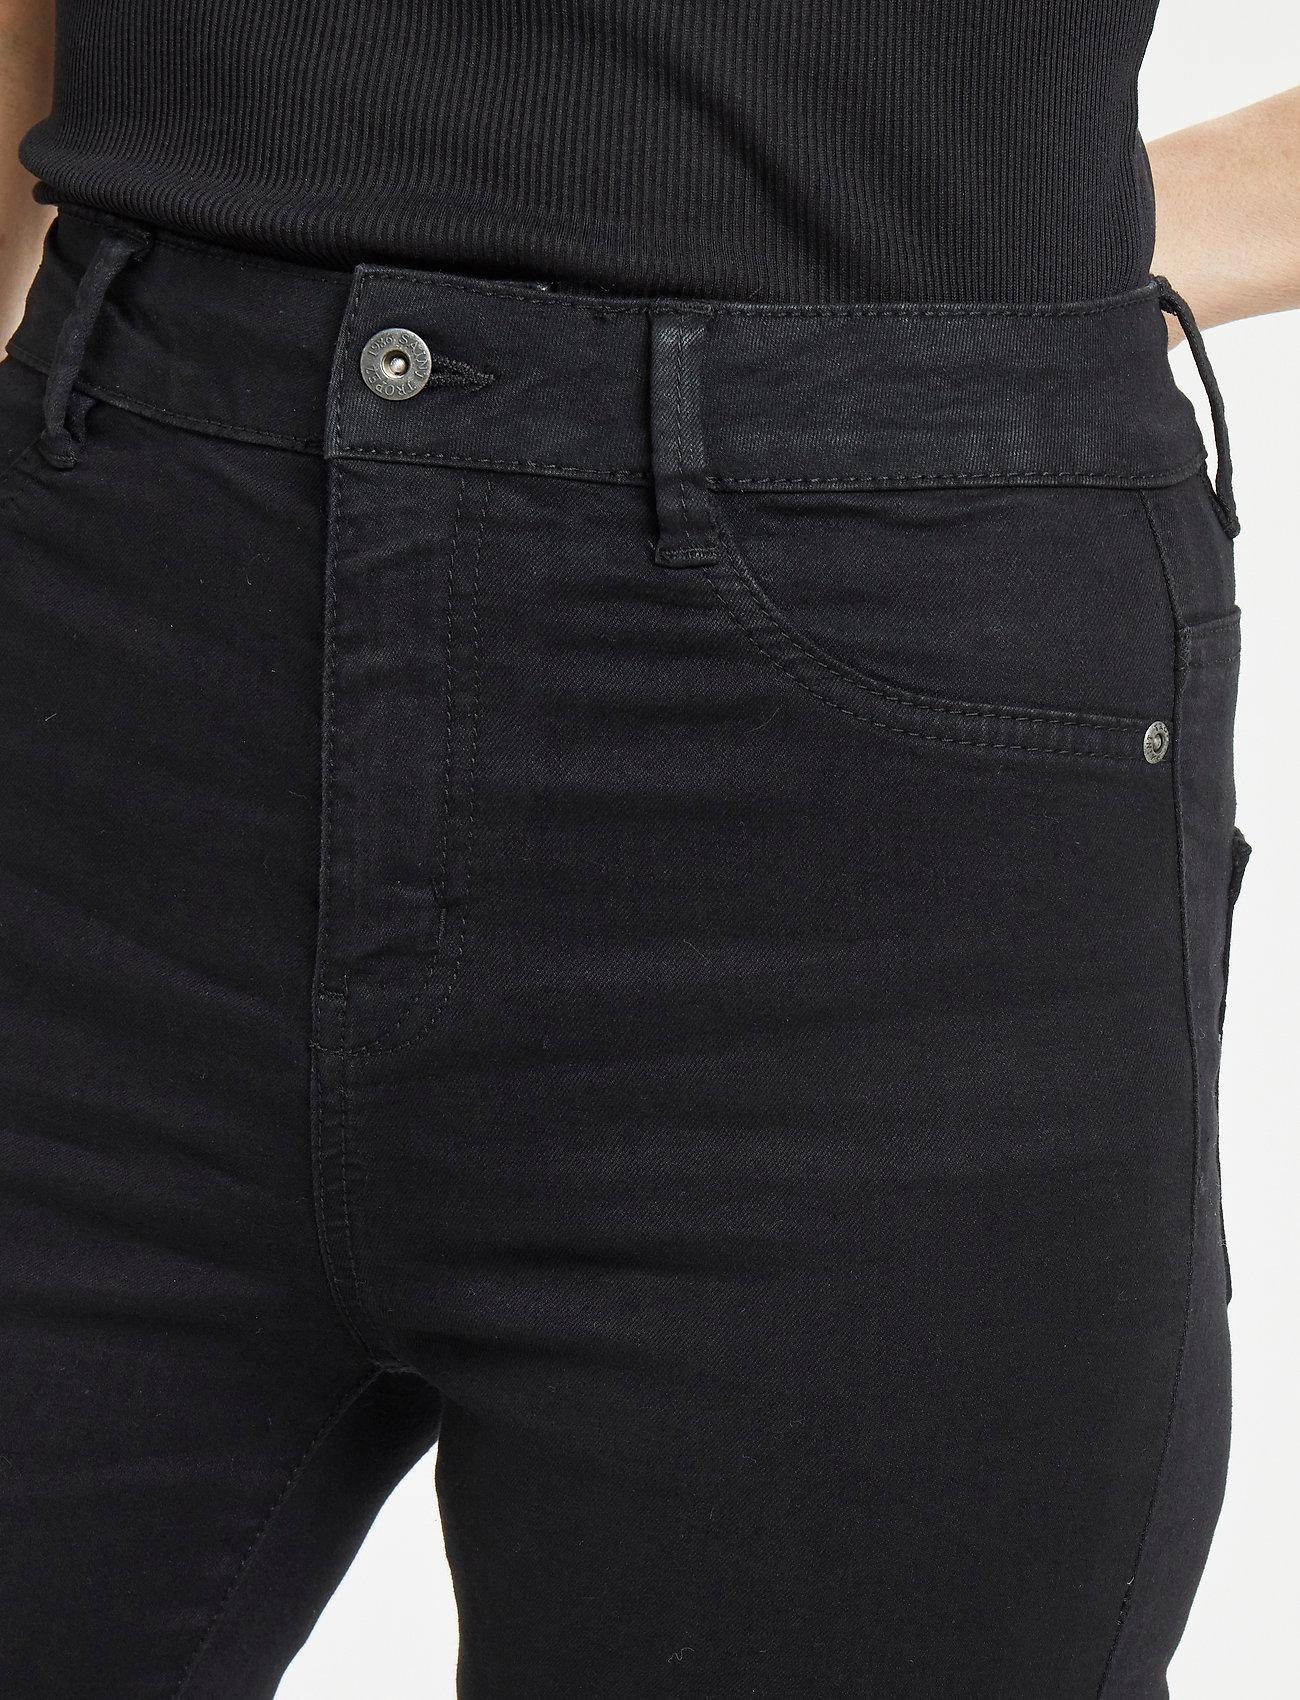 Saint Tropez - T5757, UllaSZ Jeans - skinny jeans - black - 6